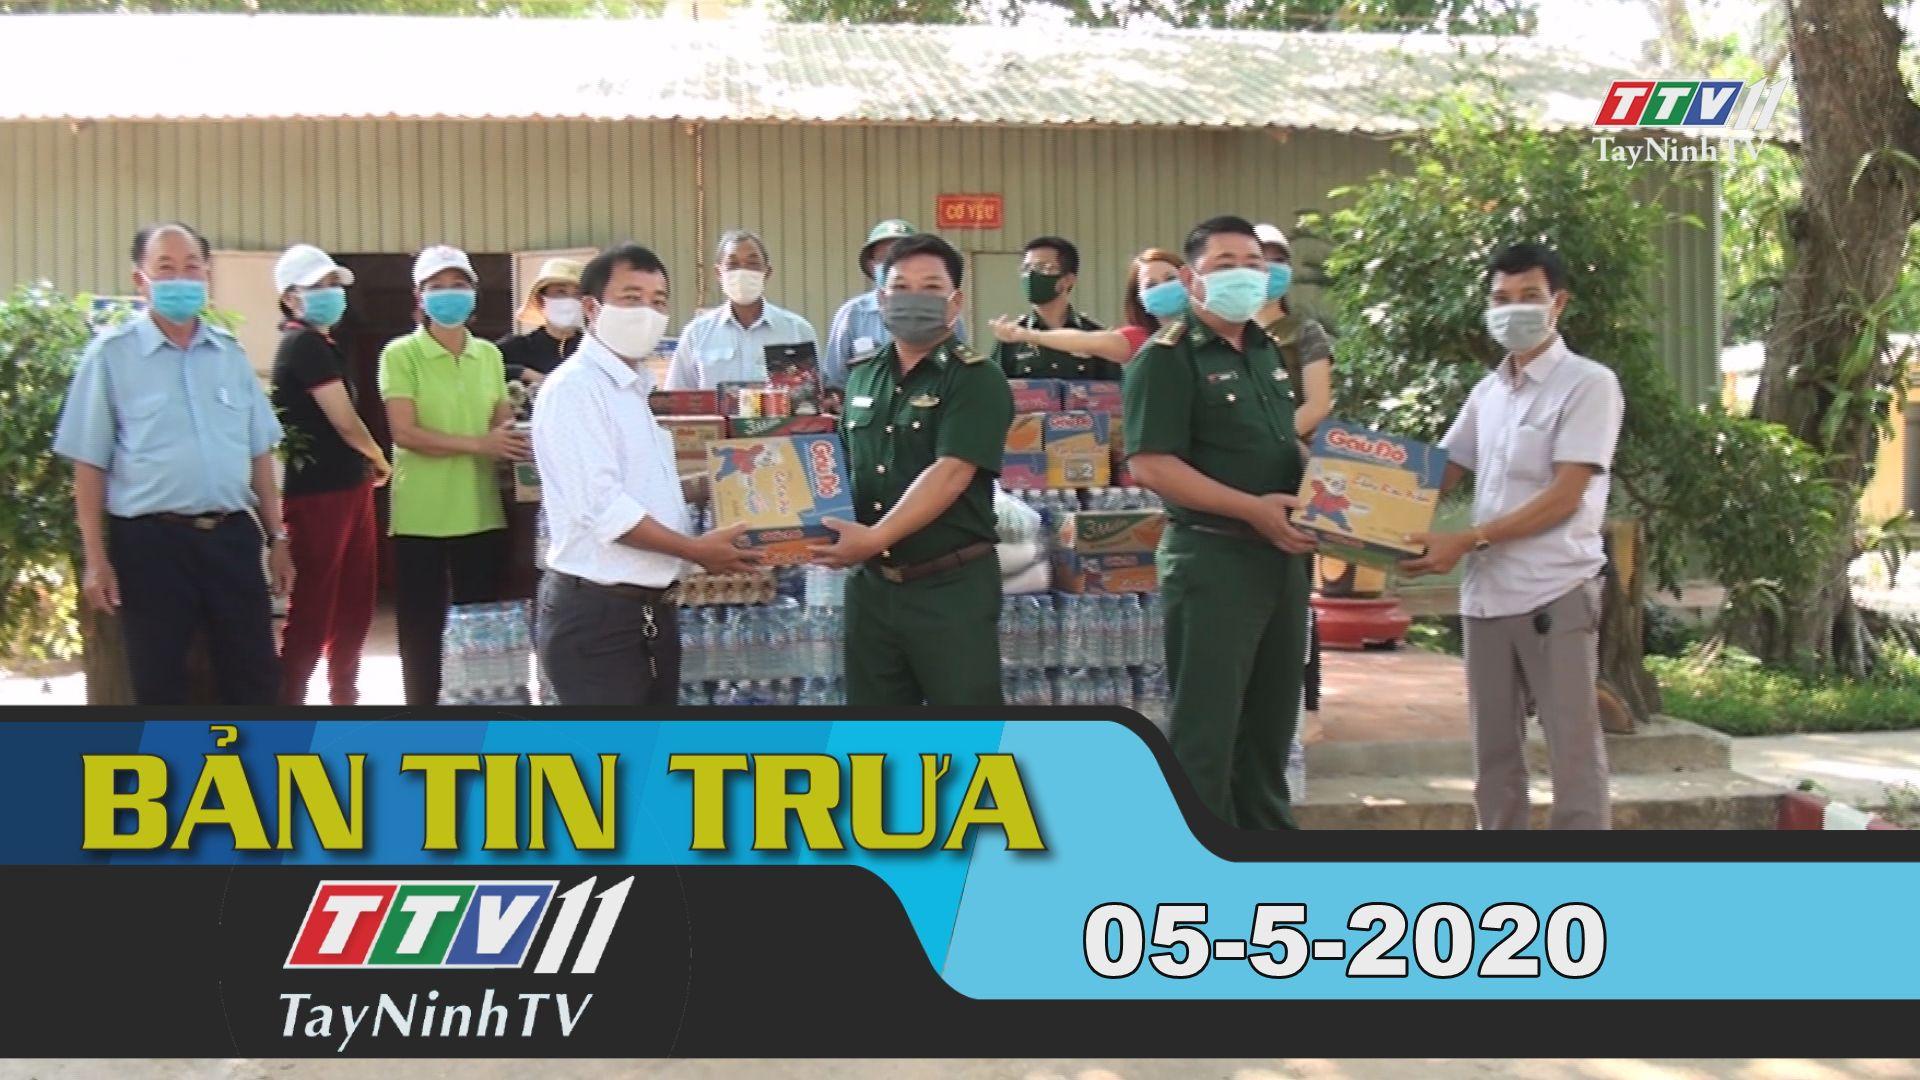 Bản tin trưa 05-5-2020 | Tin tức hôm nay | TayNinhTV